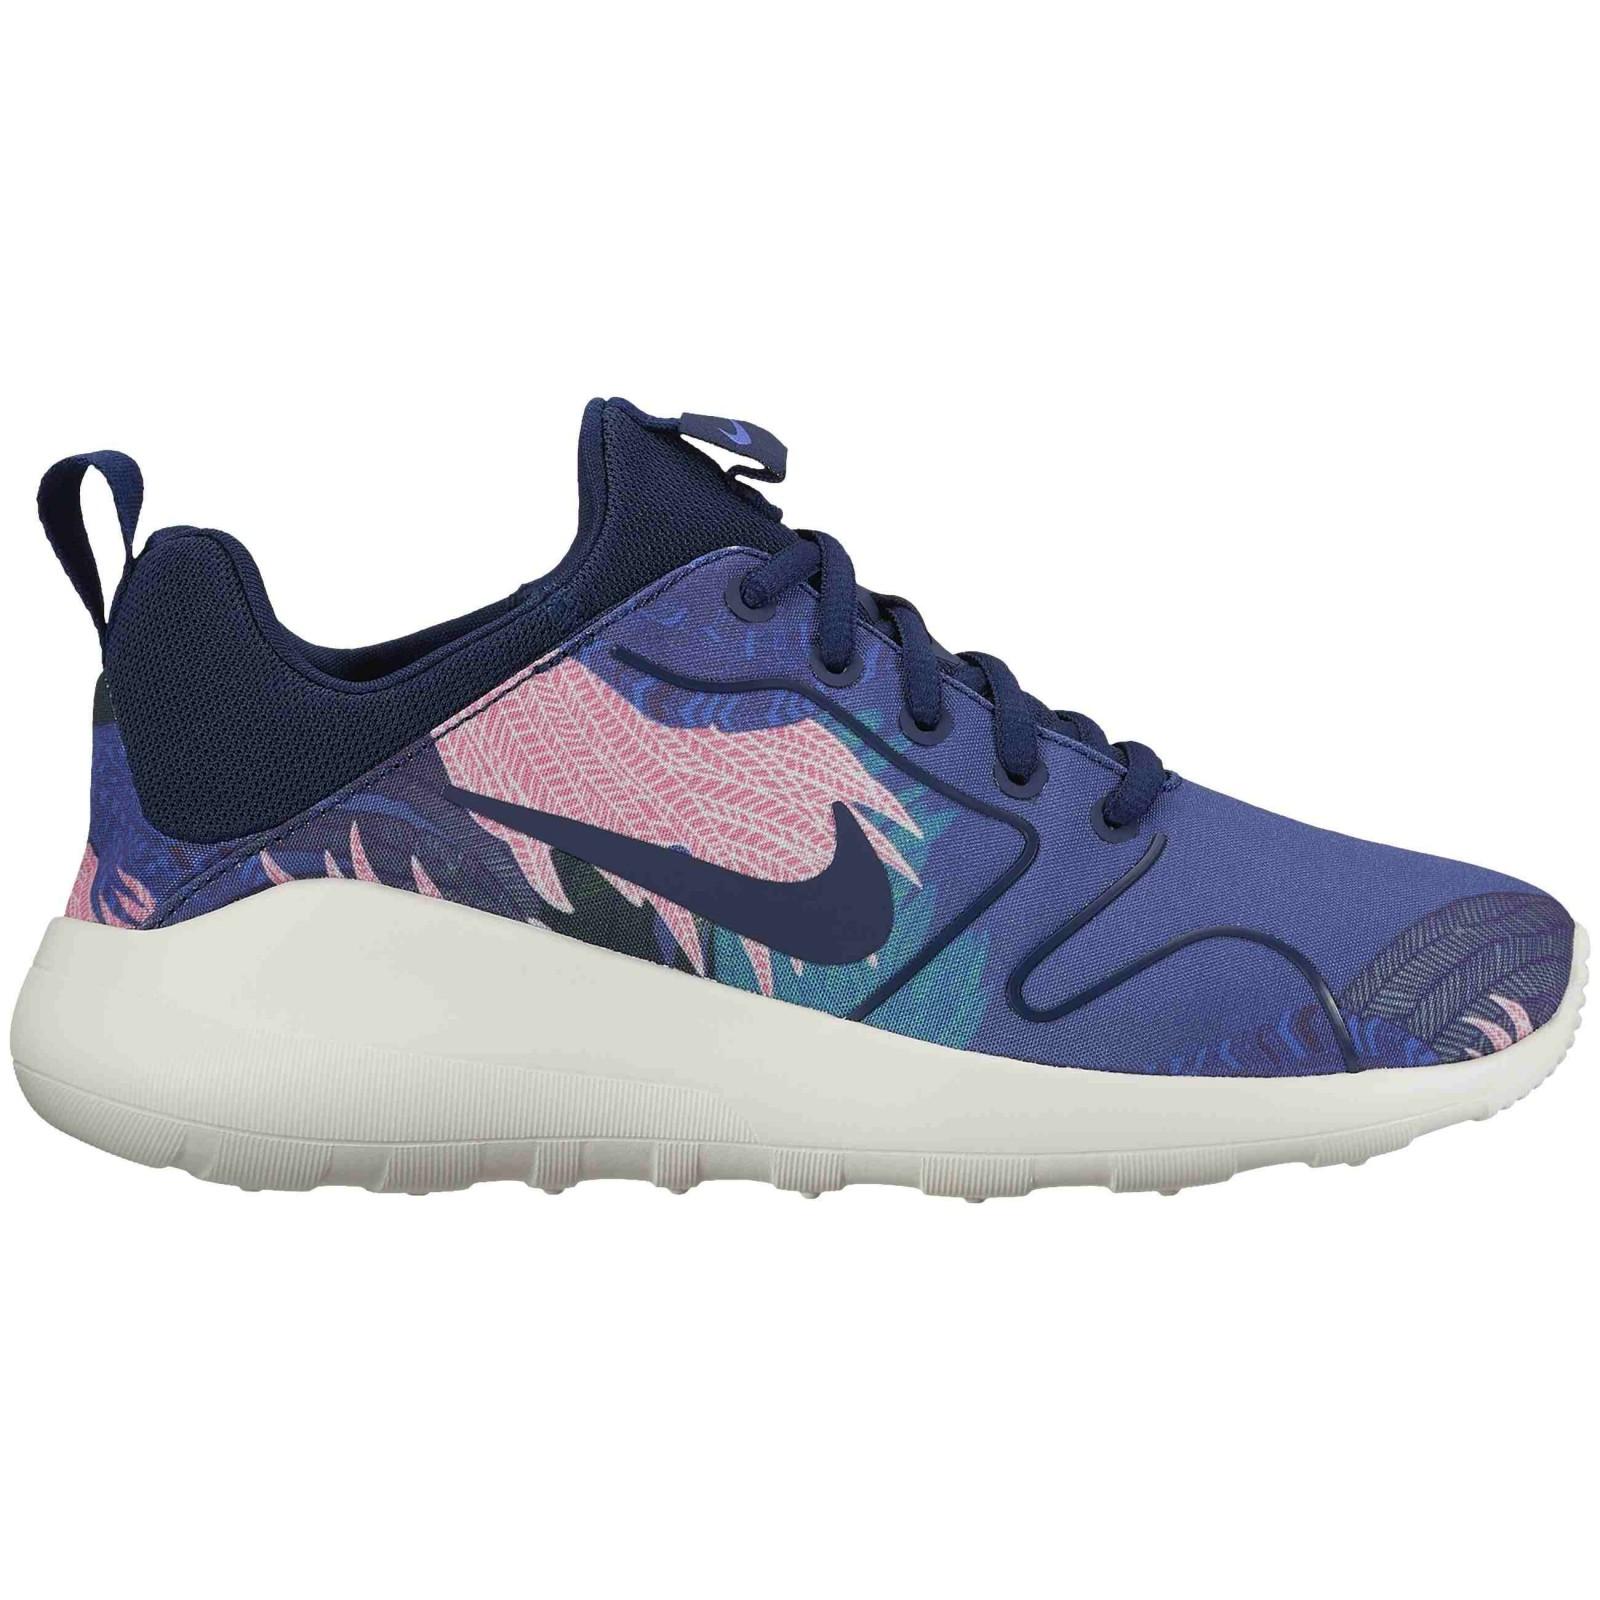 10ebf9c177f Dámské tenisky Nike WMNS KAISHI 2.0 PRINT BINARY BLUE BINARY BLUE ...